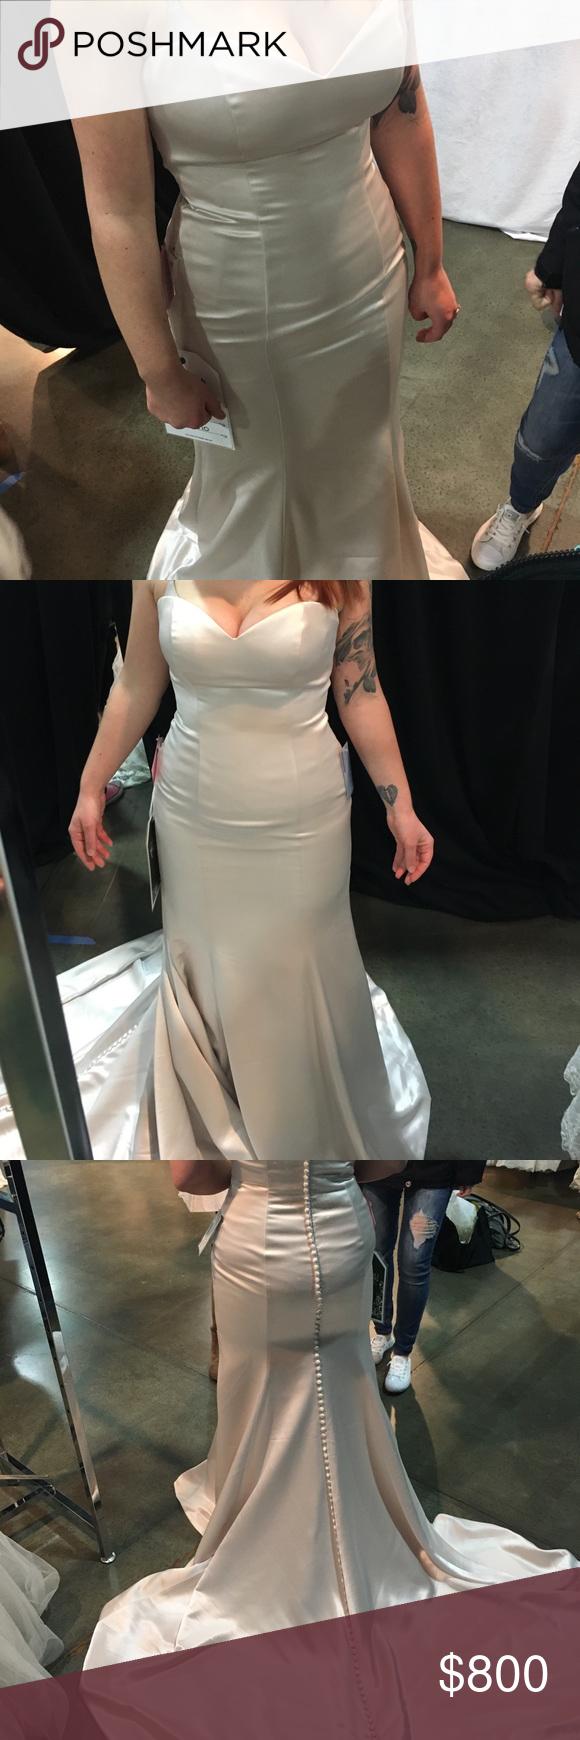 Ksl wedding dress  Justin Alexander Wedding Dress NWT  Size  Corset and Customer